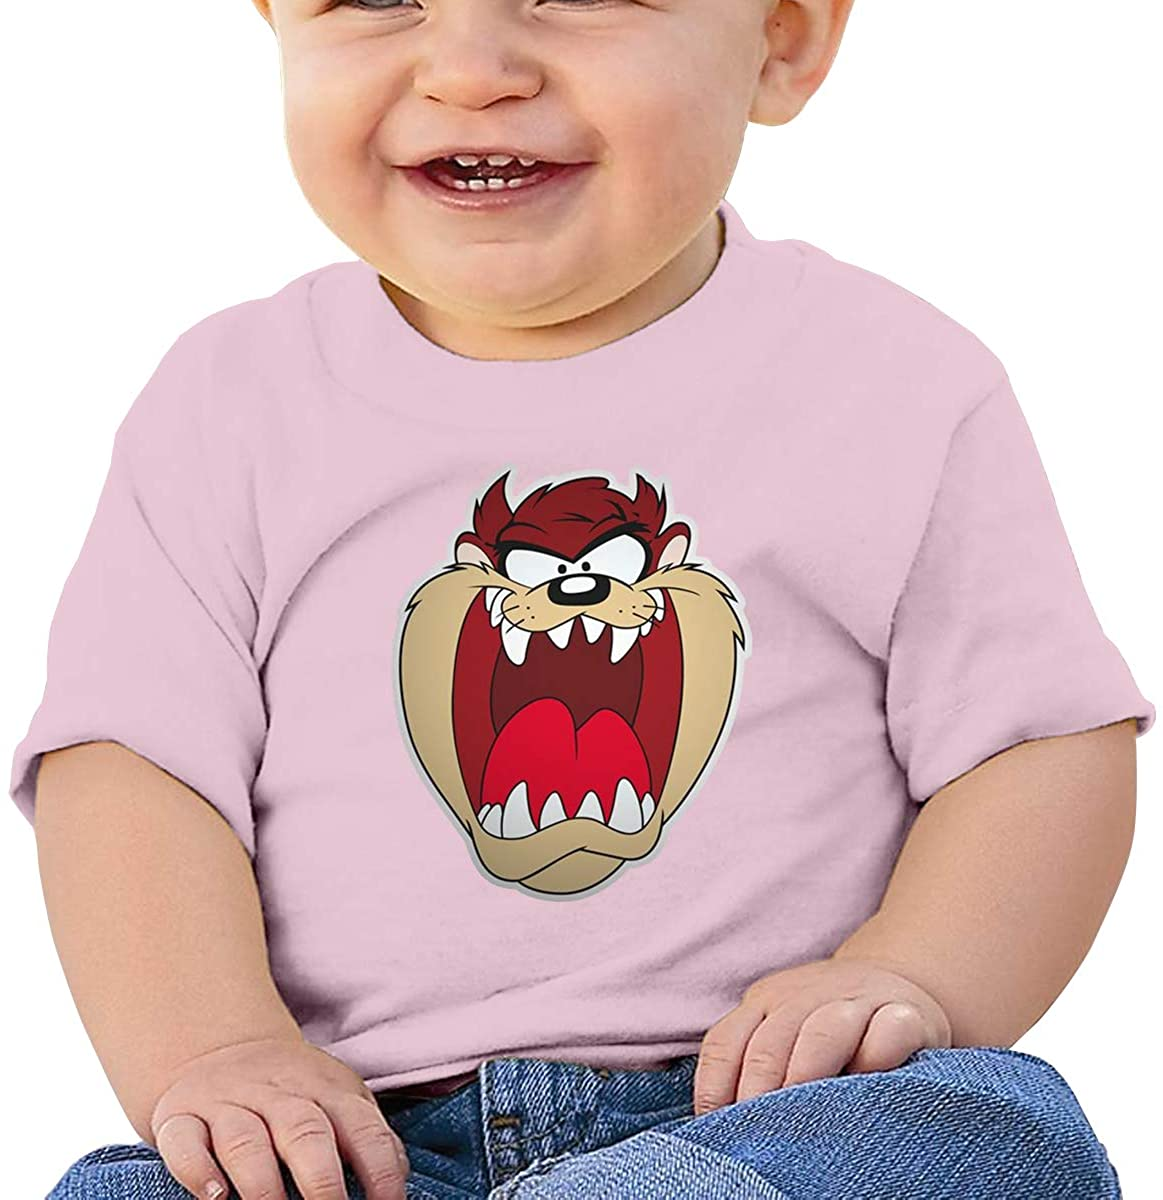 6-24 Months Boy and Girl Baby Short Sleeve T-Shirt Looney Tunes Tasmanian Devil Taz Original Minimalist Style Pink